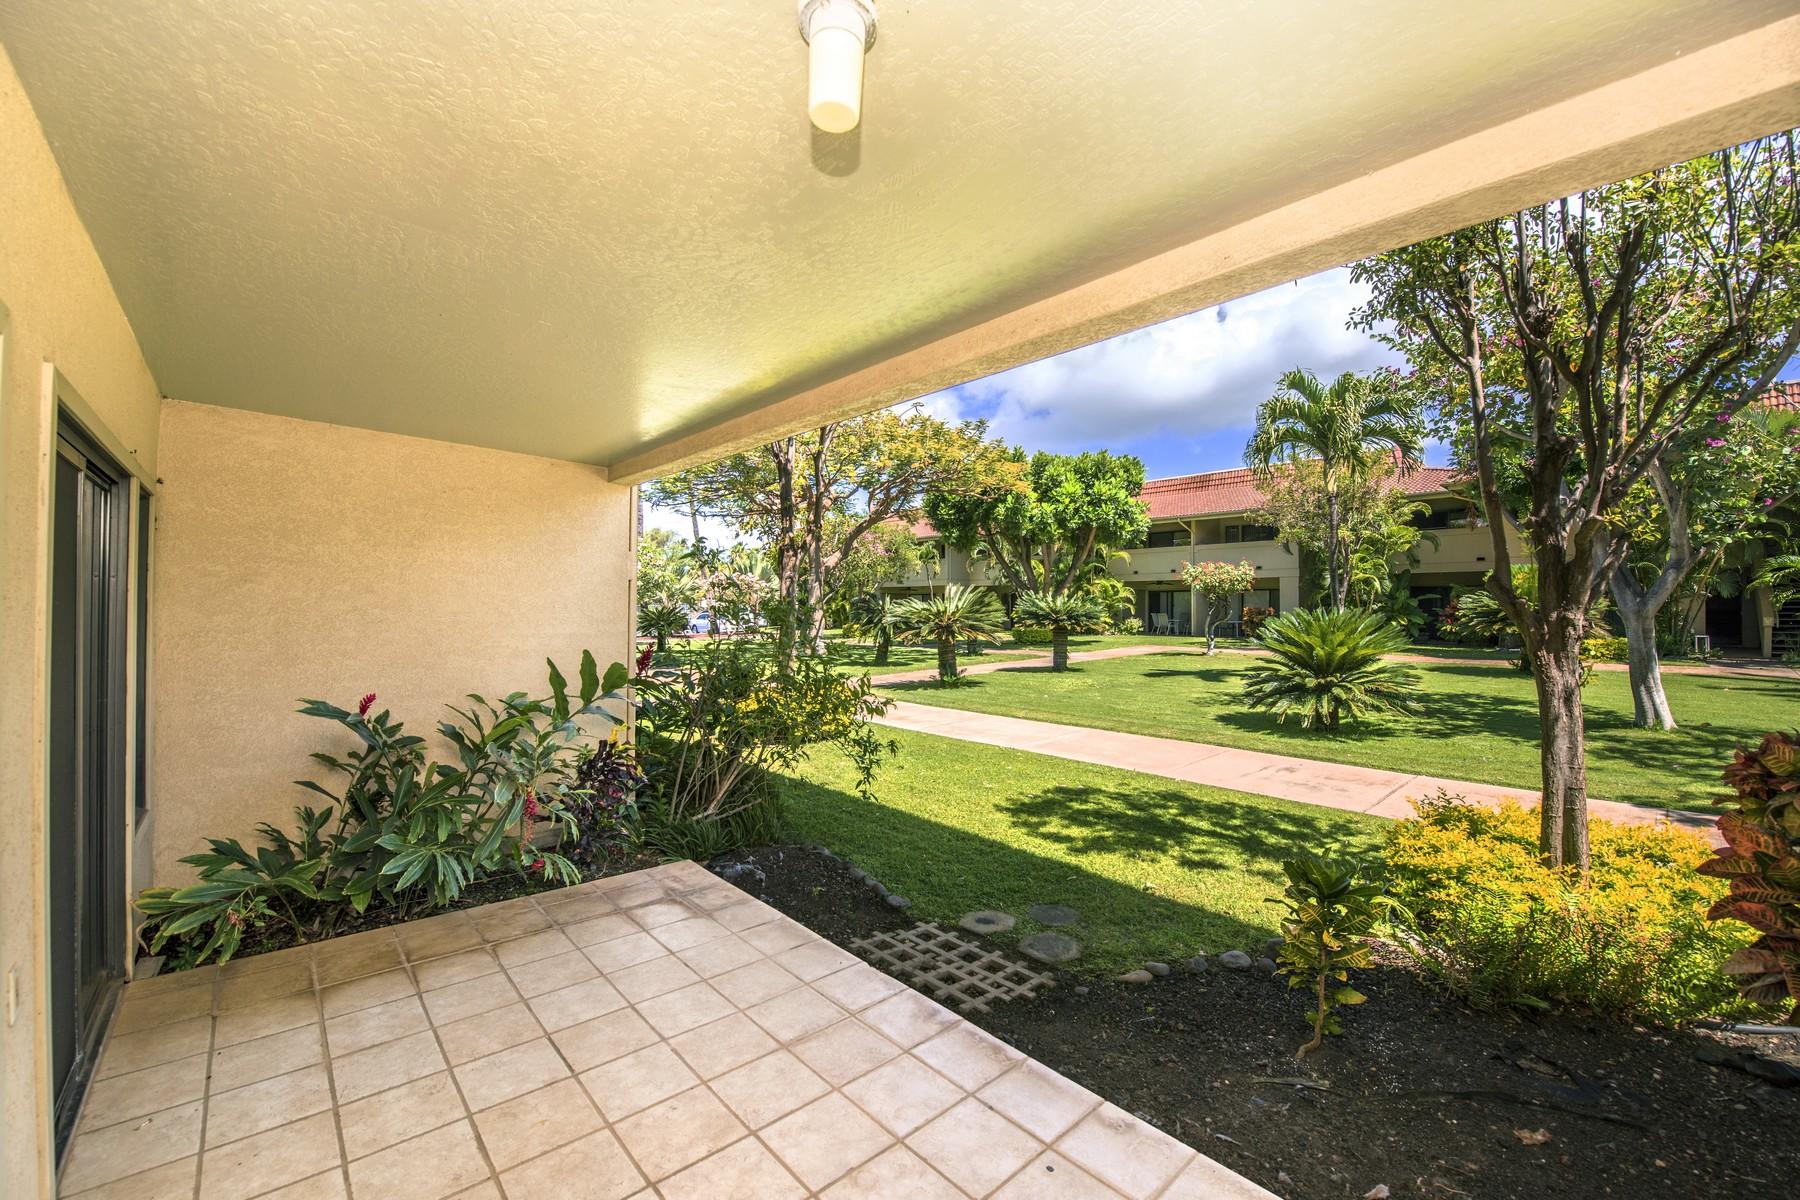 Кооперативная квартира для того Продажа на Affordable South Maui Condo with Pool & Tennis Court 1450 South Kihei Road, Maui Gardens C104 Kihei, Гавайи, 96753 Соединенные Штаты